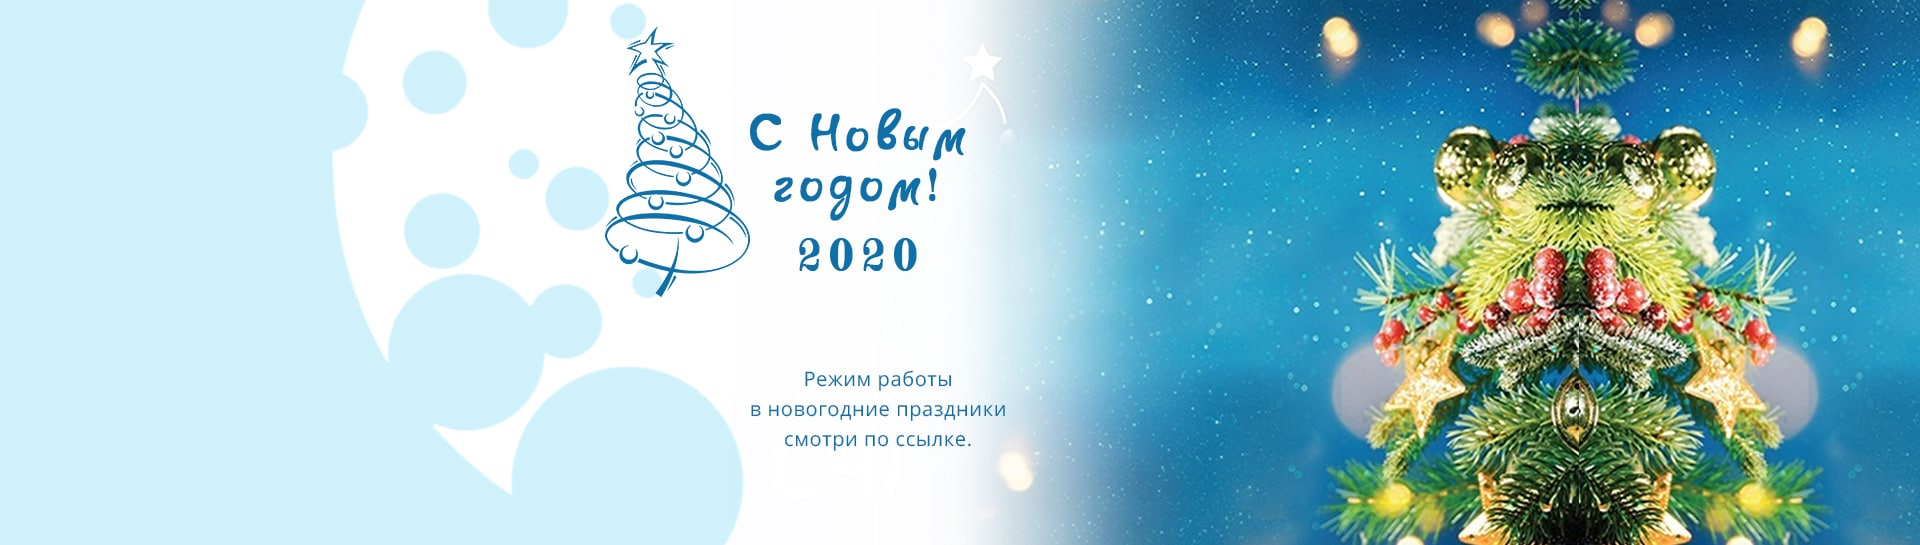 https://denta-maryino.ru/wp-content/uploads/Banner-dlya-sajta-4.jpg 1x, https://denta-maryino.ru/wp-content/cache/thumb/bc/3f6c08ec605afbc_1320x545.jpg 1320w